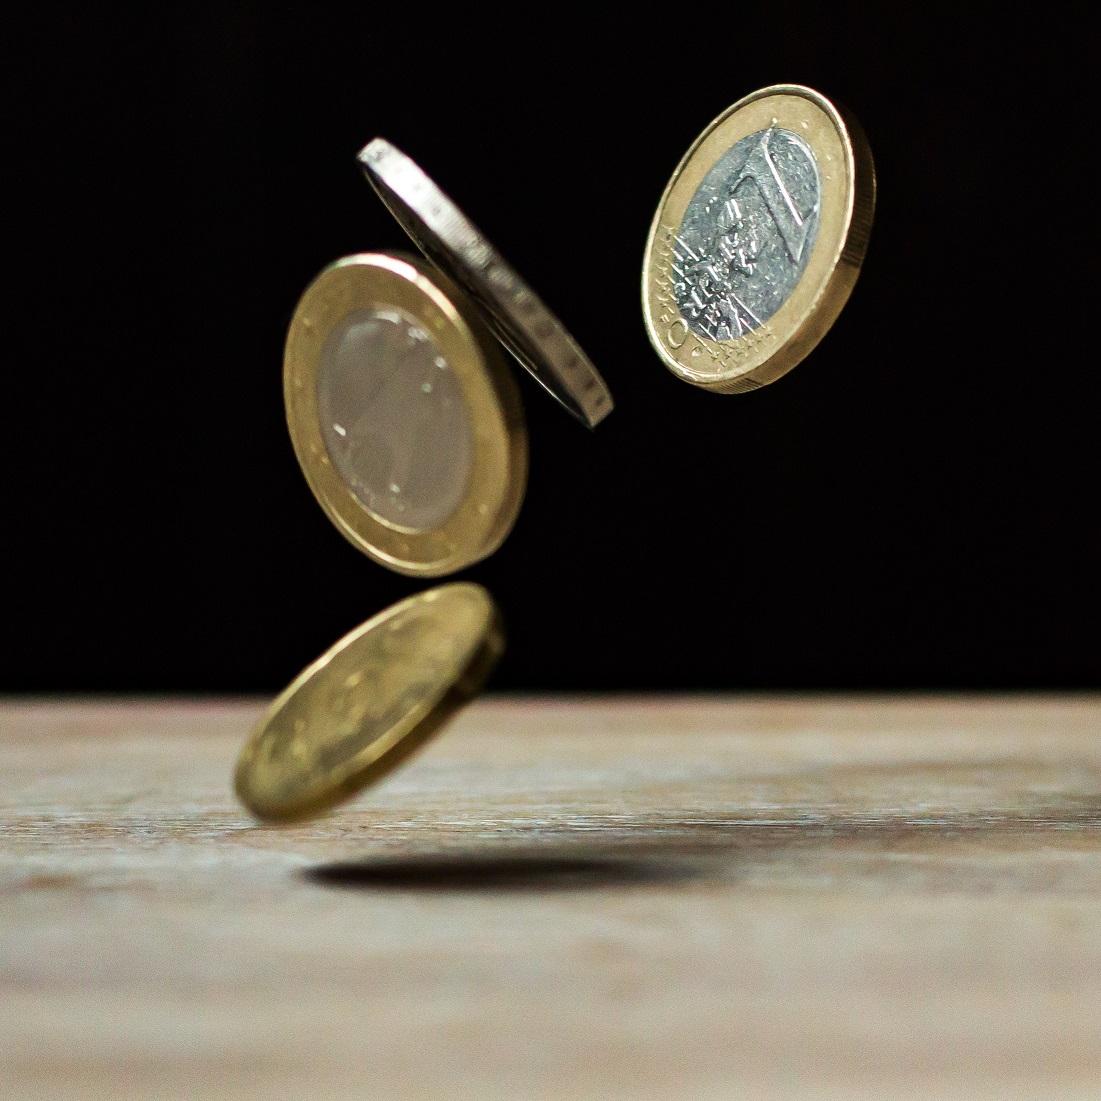 Preisstatistik: Heizöl wird wieder teurer